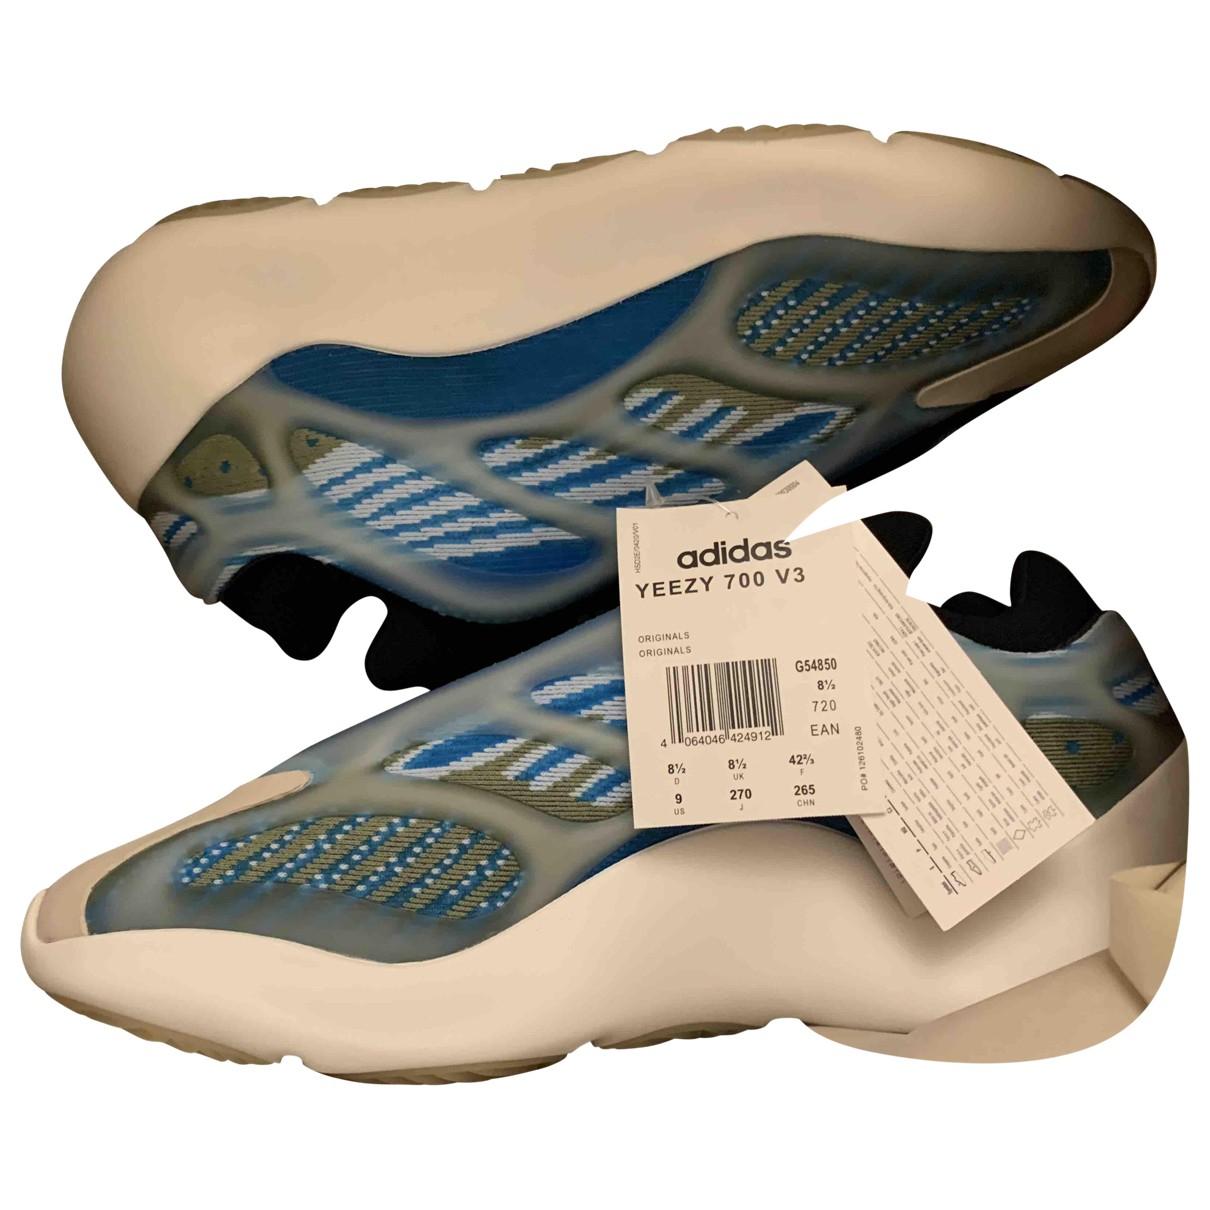 Yeezy X Adidas - Baskets Boost 700 V3 pour homme en toile - bleu